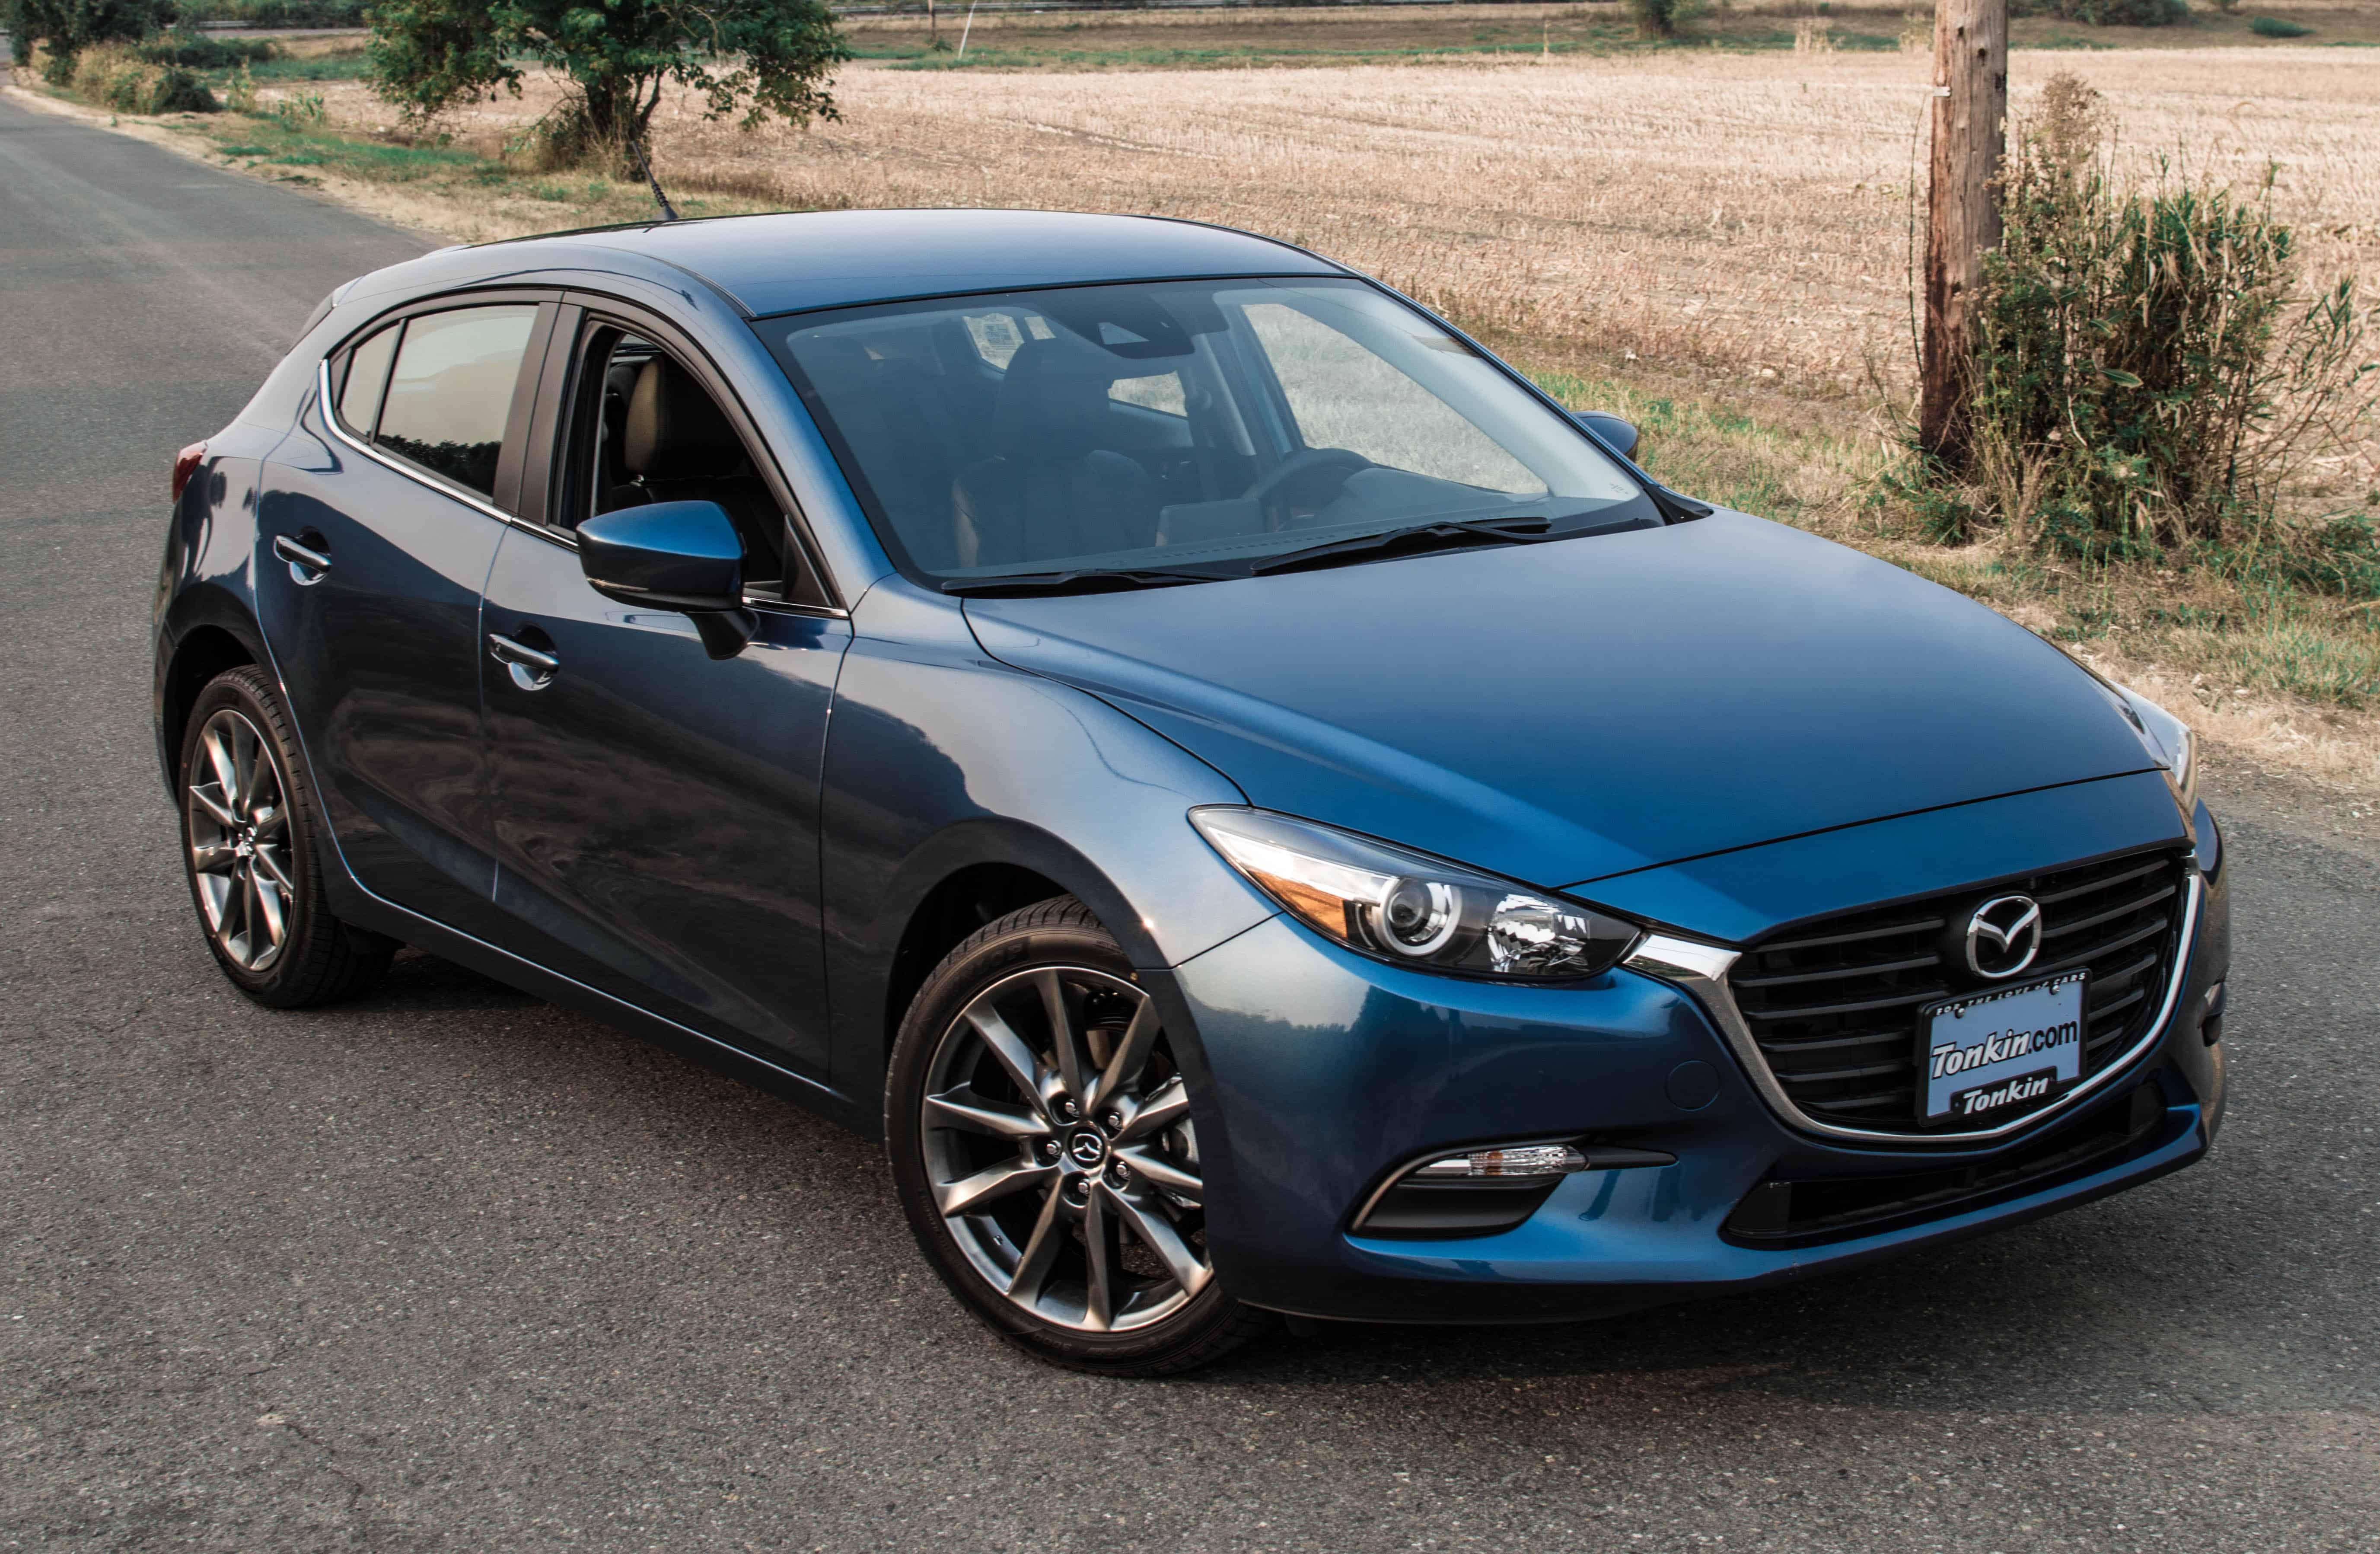 FACEOFF: 2018 Mazda 3 Touring vs 2017 Honda Civic Hatchback Sport